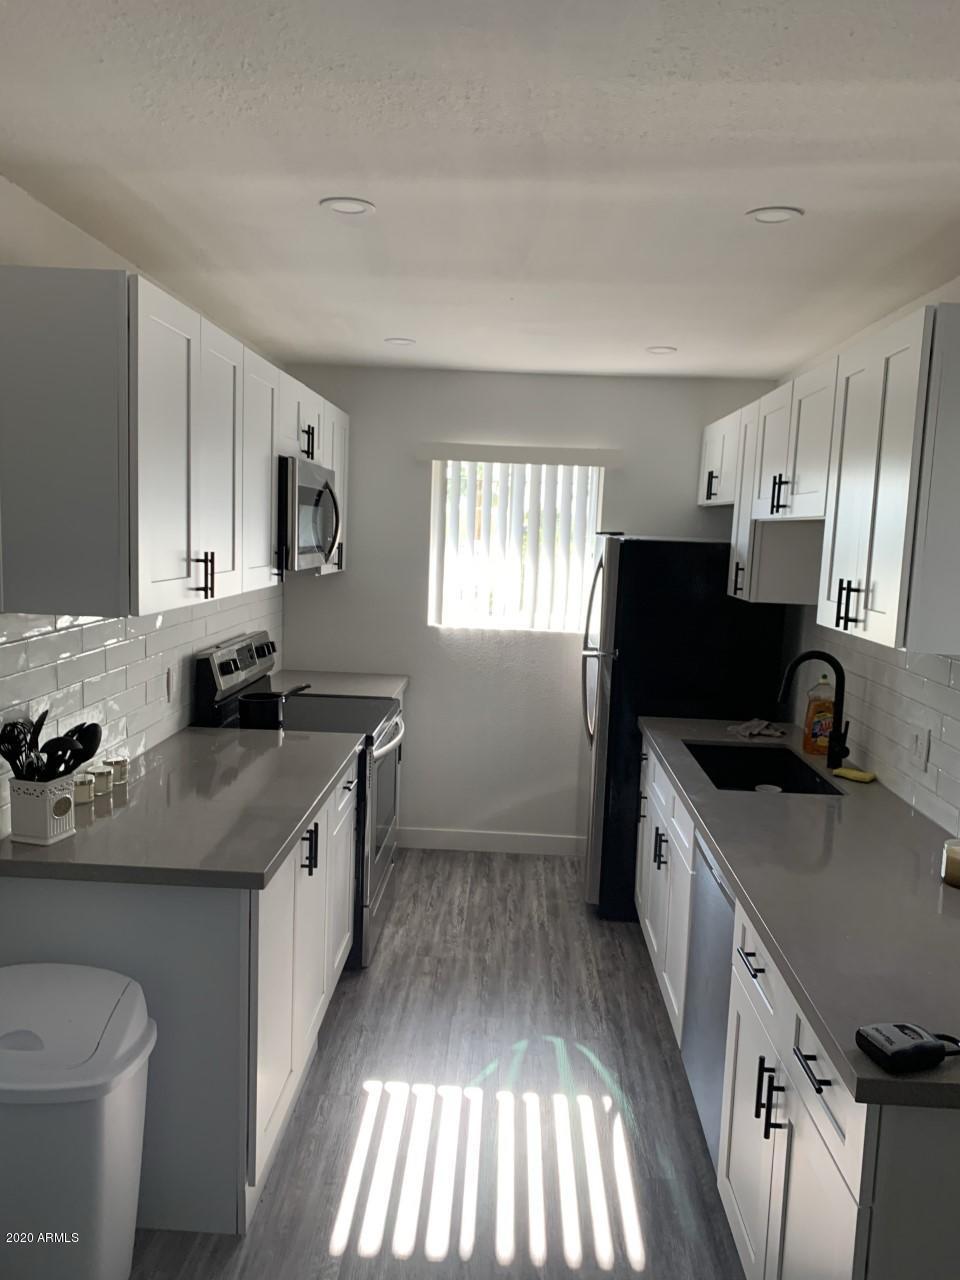 Photo for 4613 N 74th Street, Unit 11, Scottsdale, AZ 85251 (MLS # 6115315)